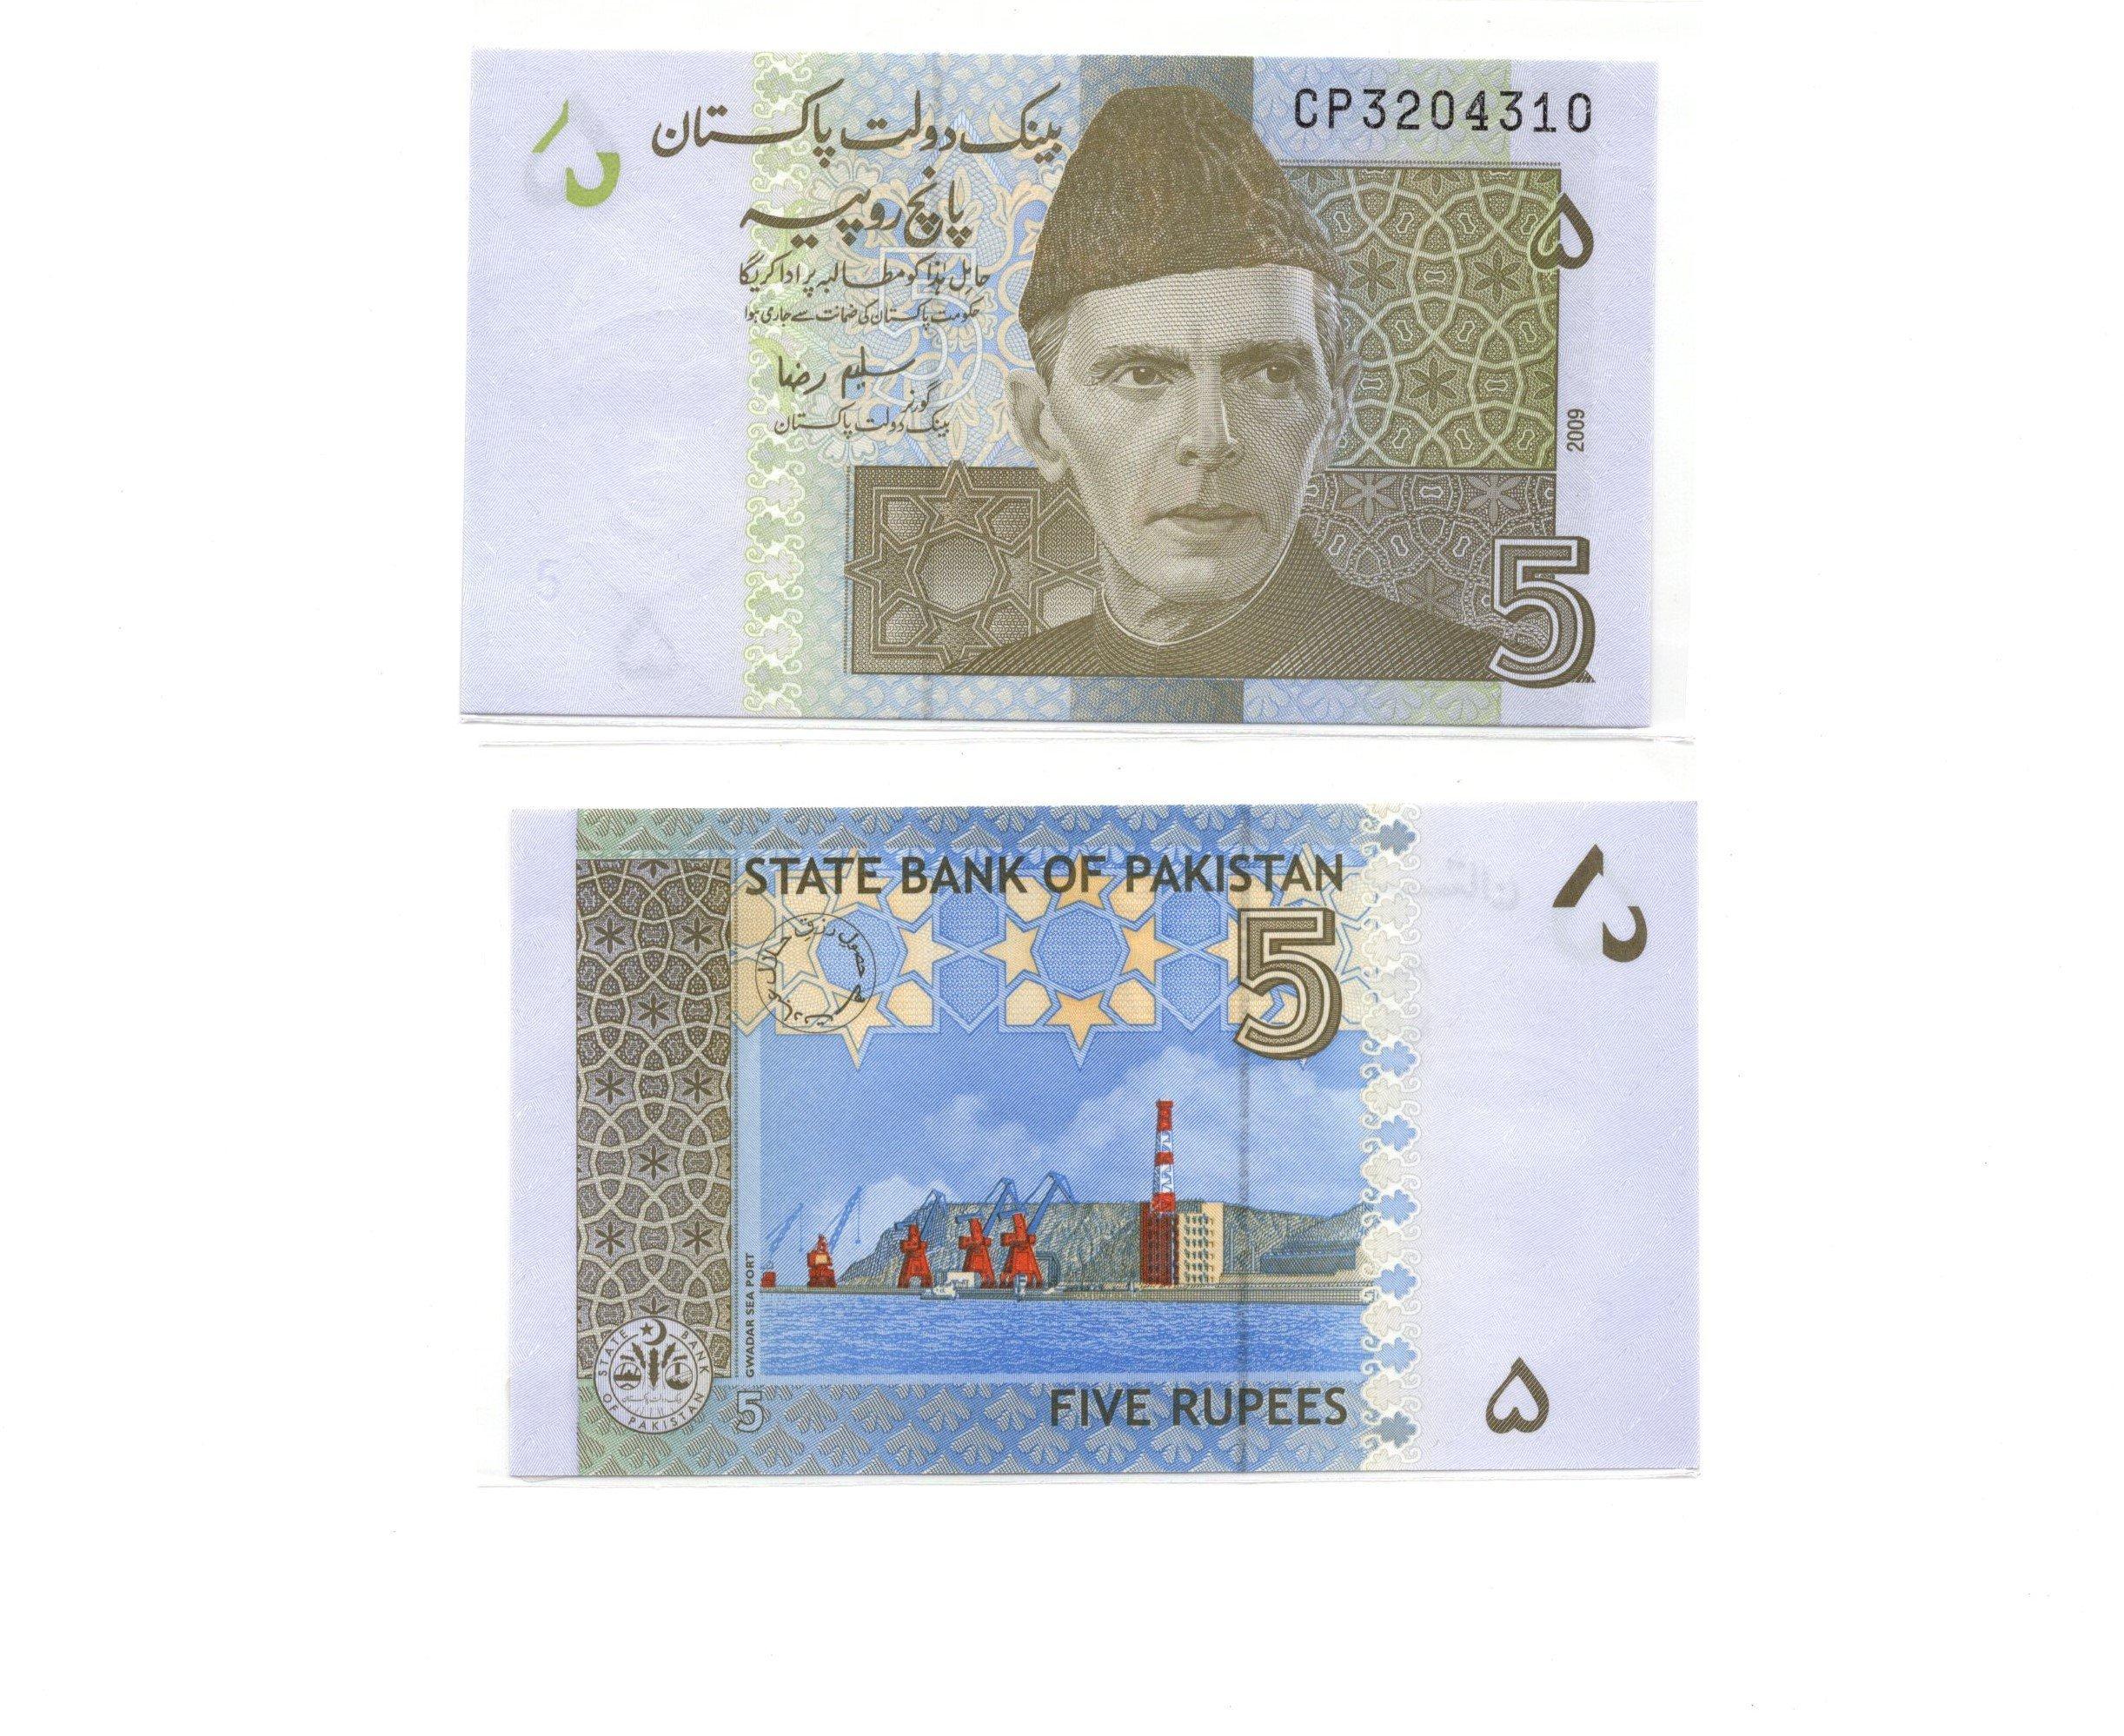 palistan 5 rupee